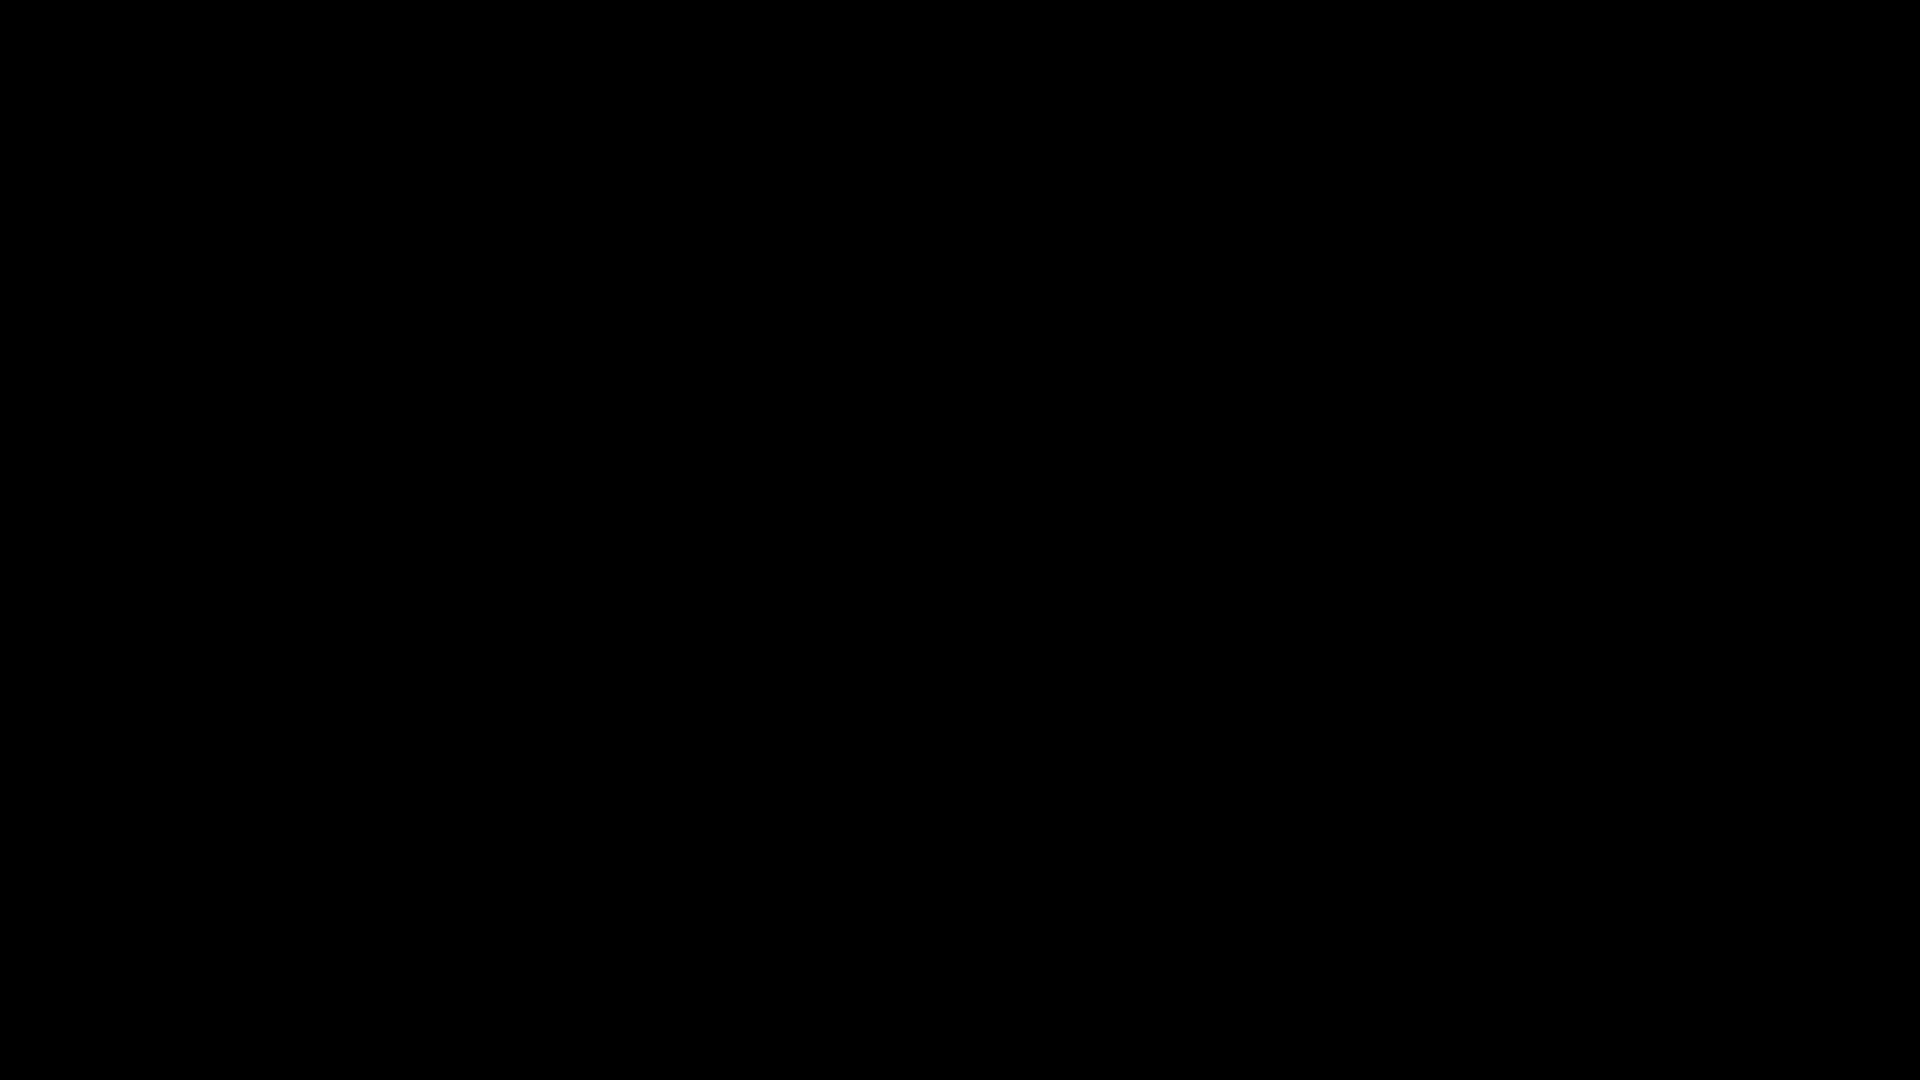 GTA: Memes - Poor kid😭💀 video cover image 0